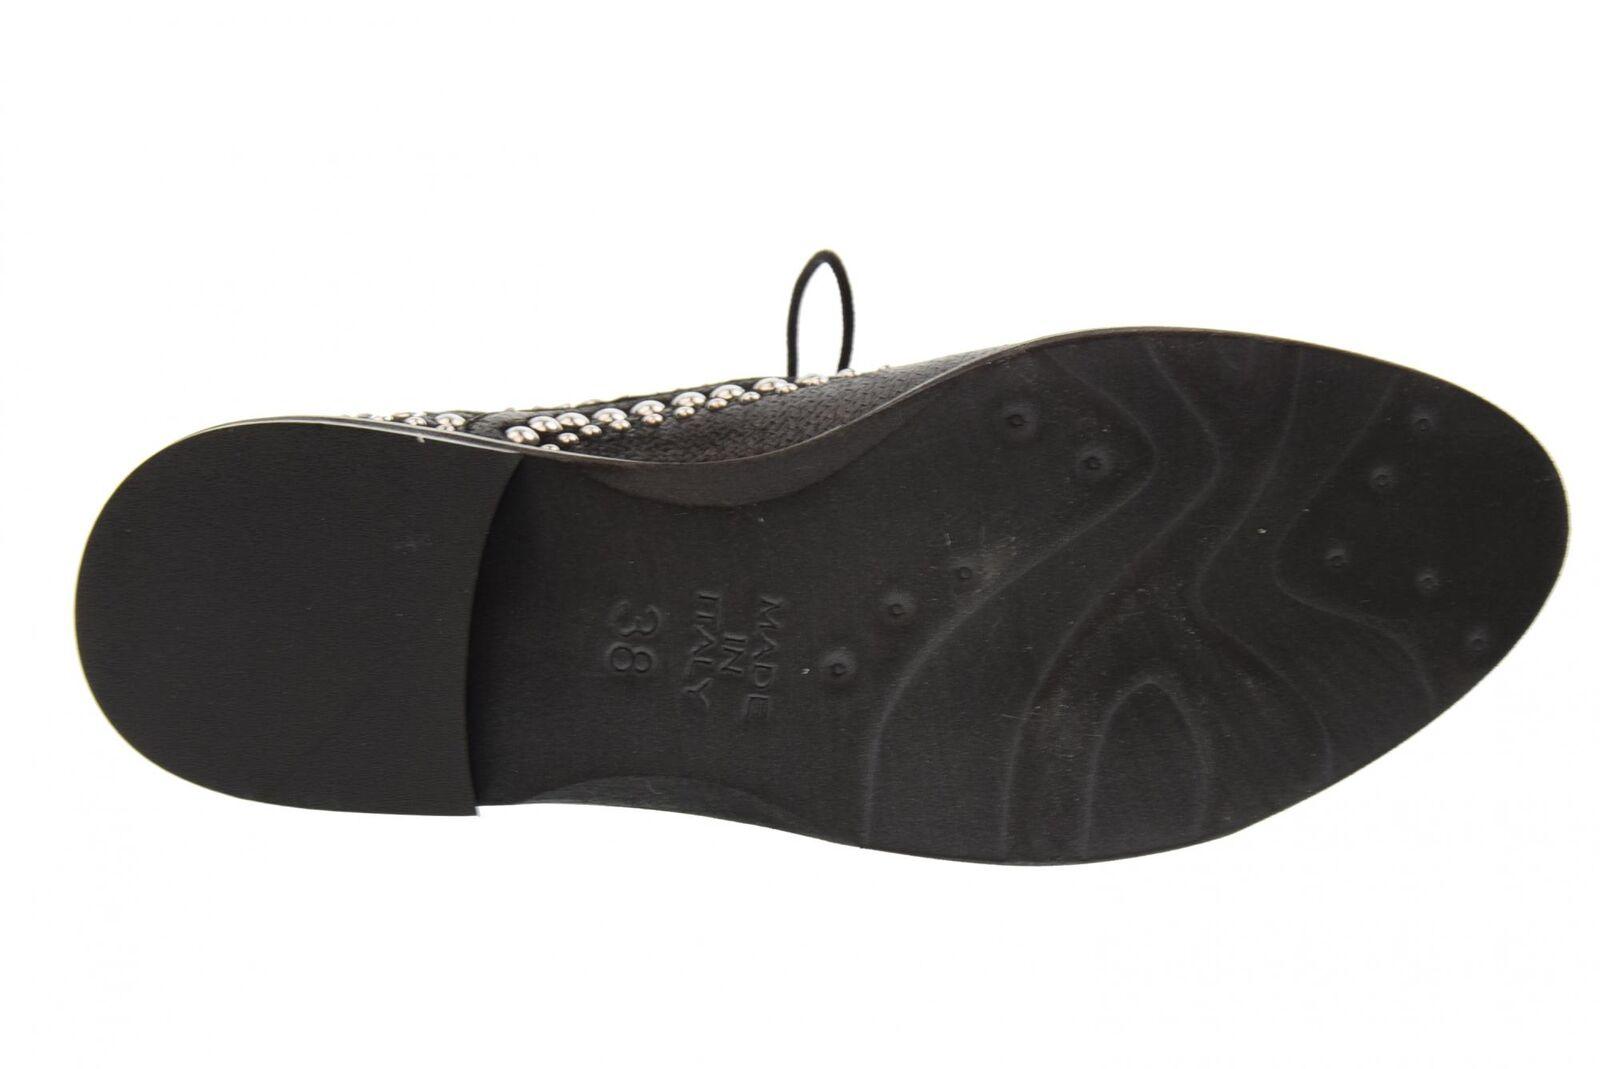 Erman's Damenschuhe Damenschuhe Damenschuhe Spitzen-125 BLACK P18g 05b7e2